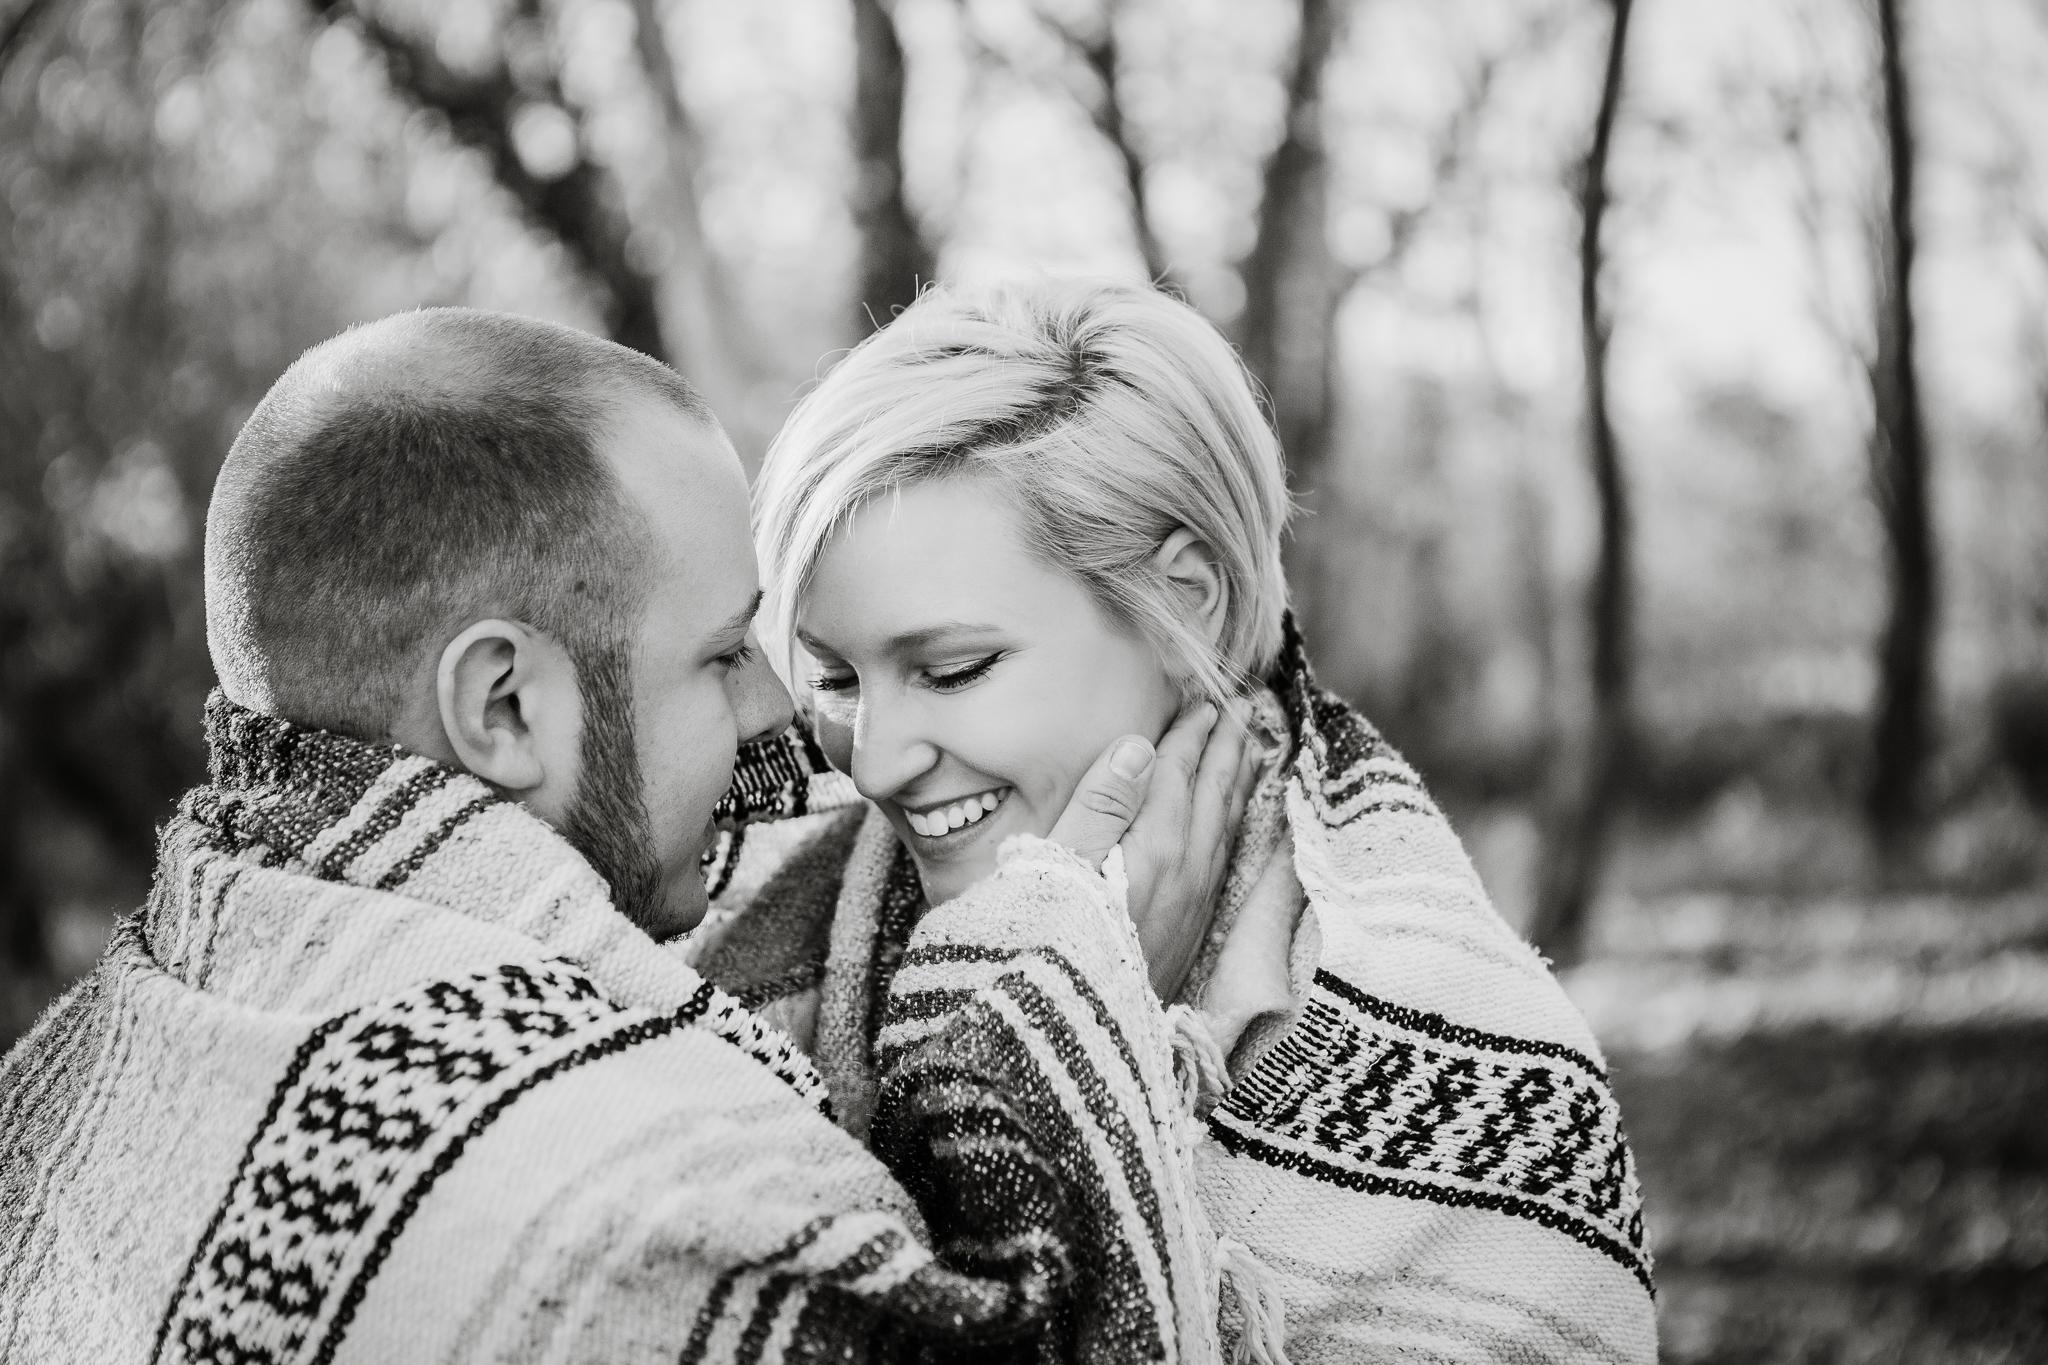 Richmond Kentucky Engagement Photographer - Ariana Jordan Photography -21.jpg